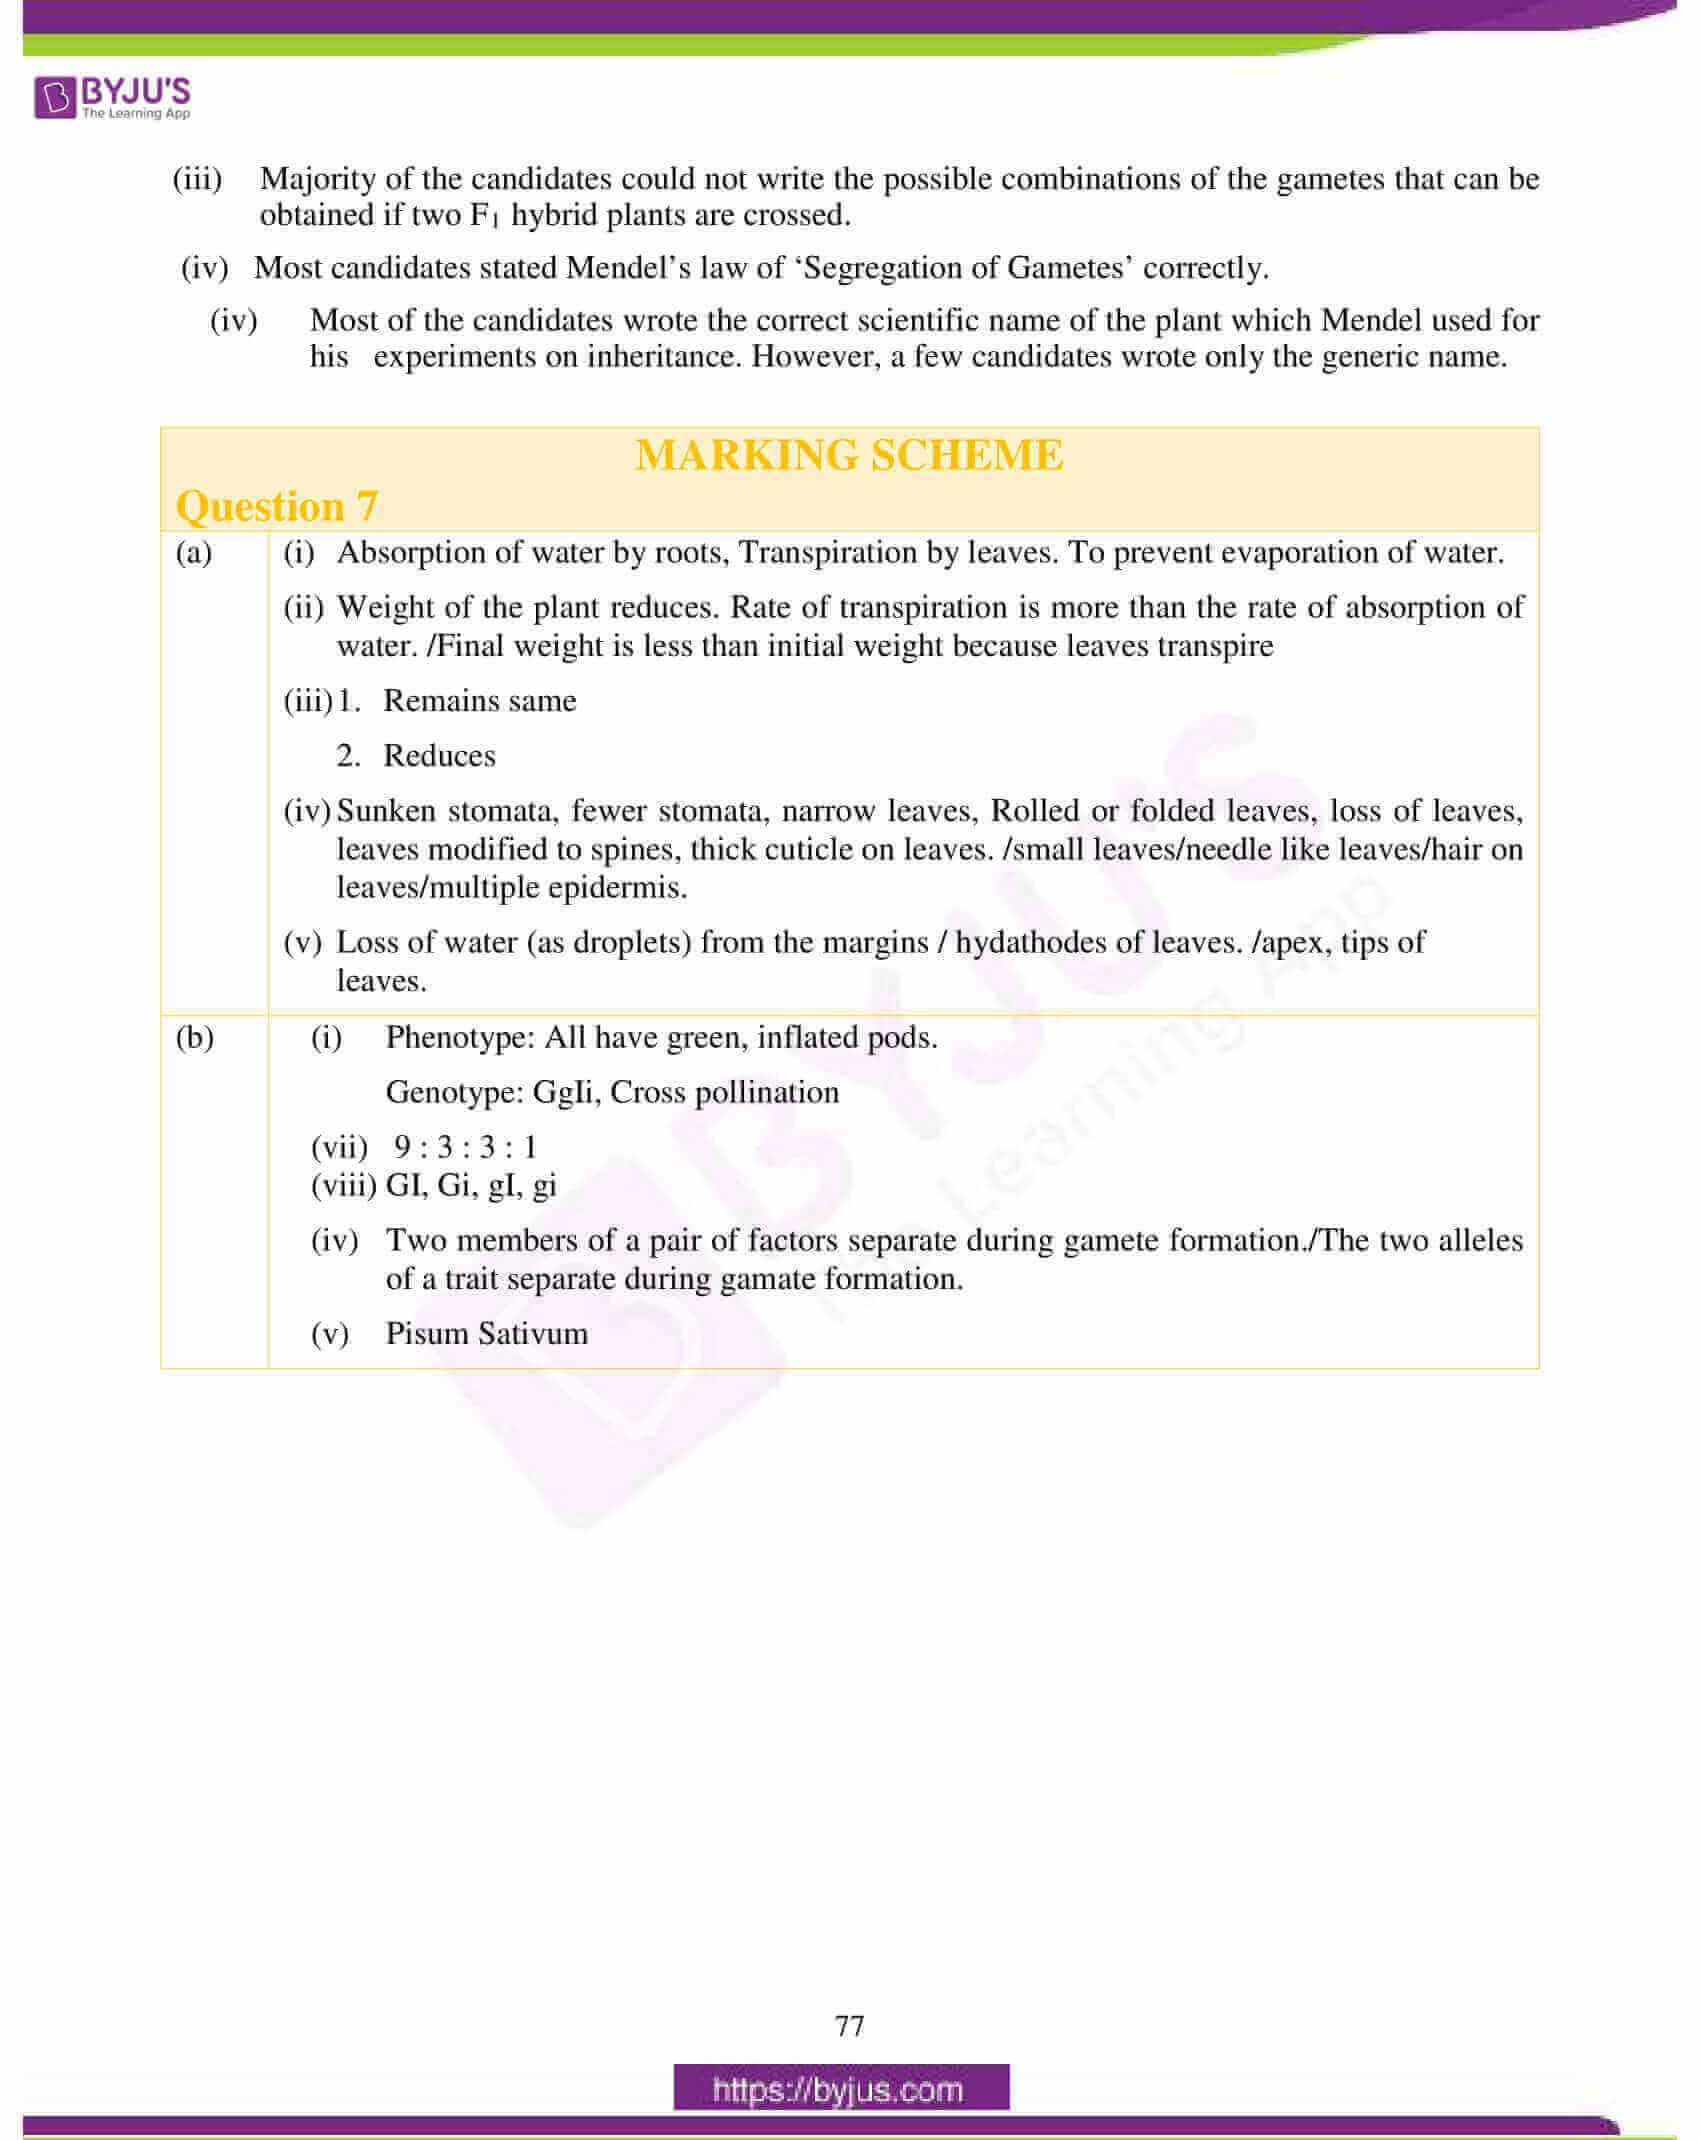 icse class 10 biology question paper solution 2018 24